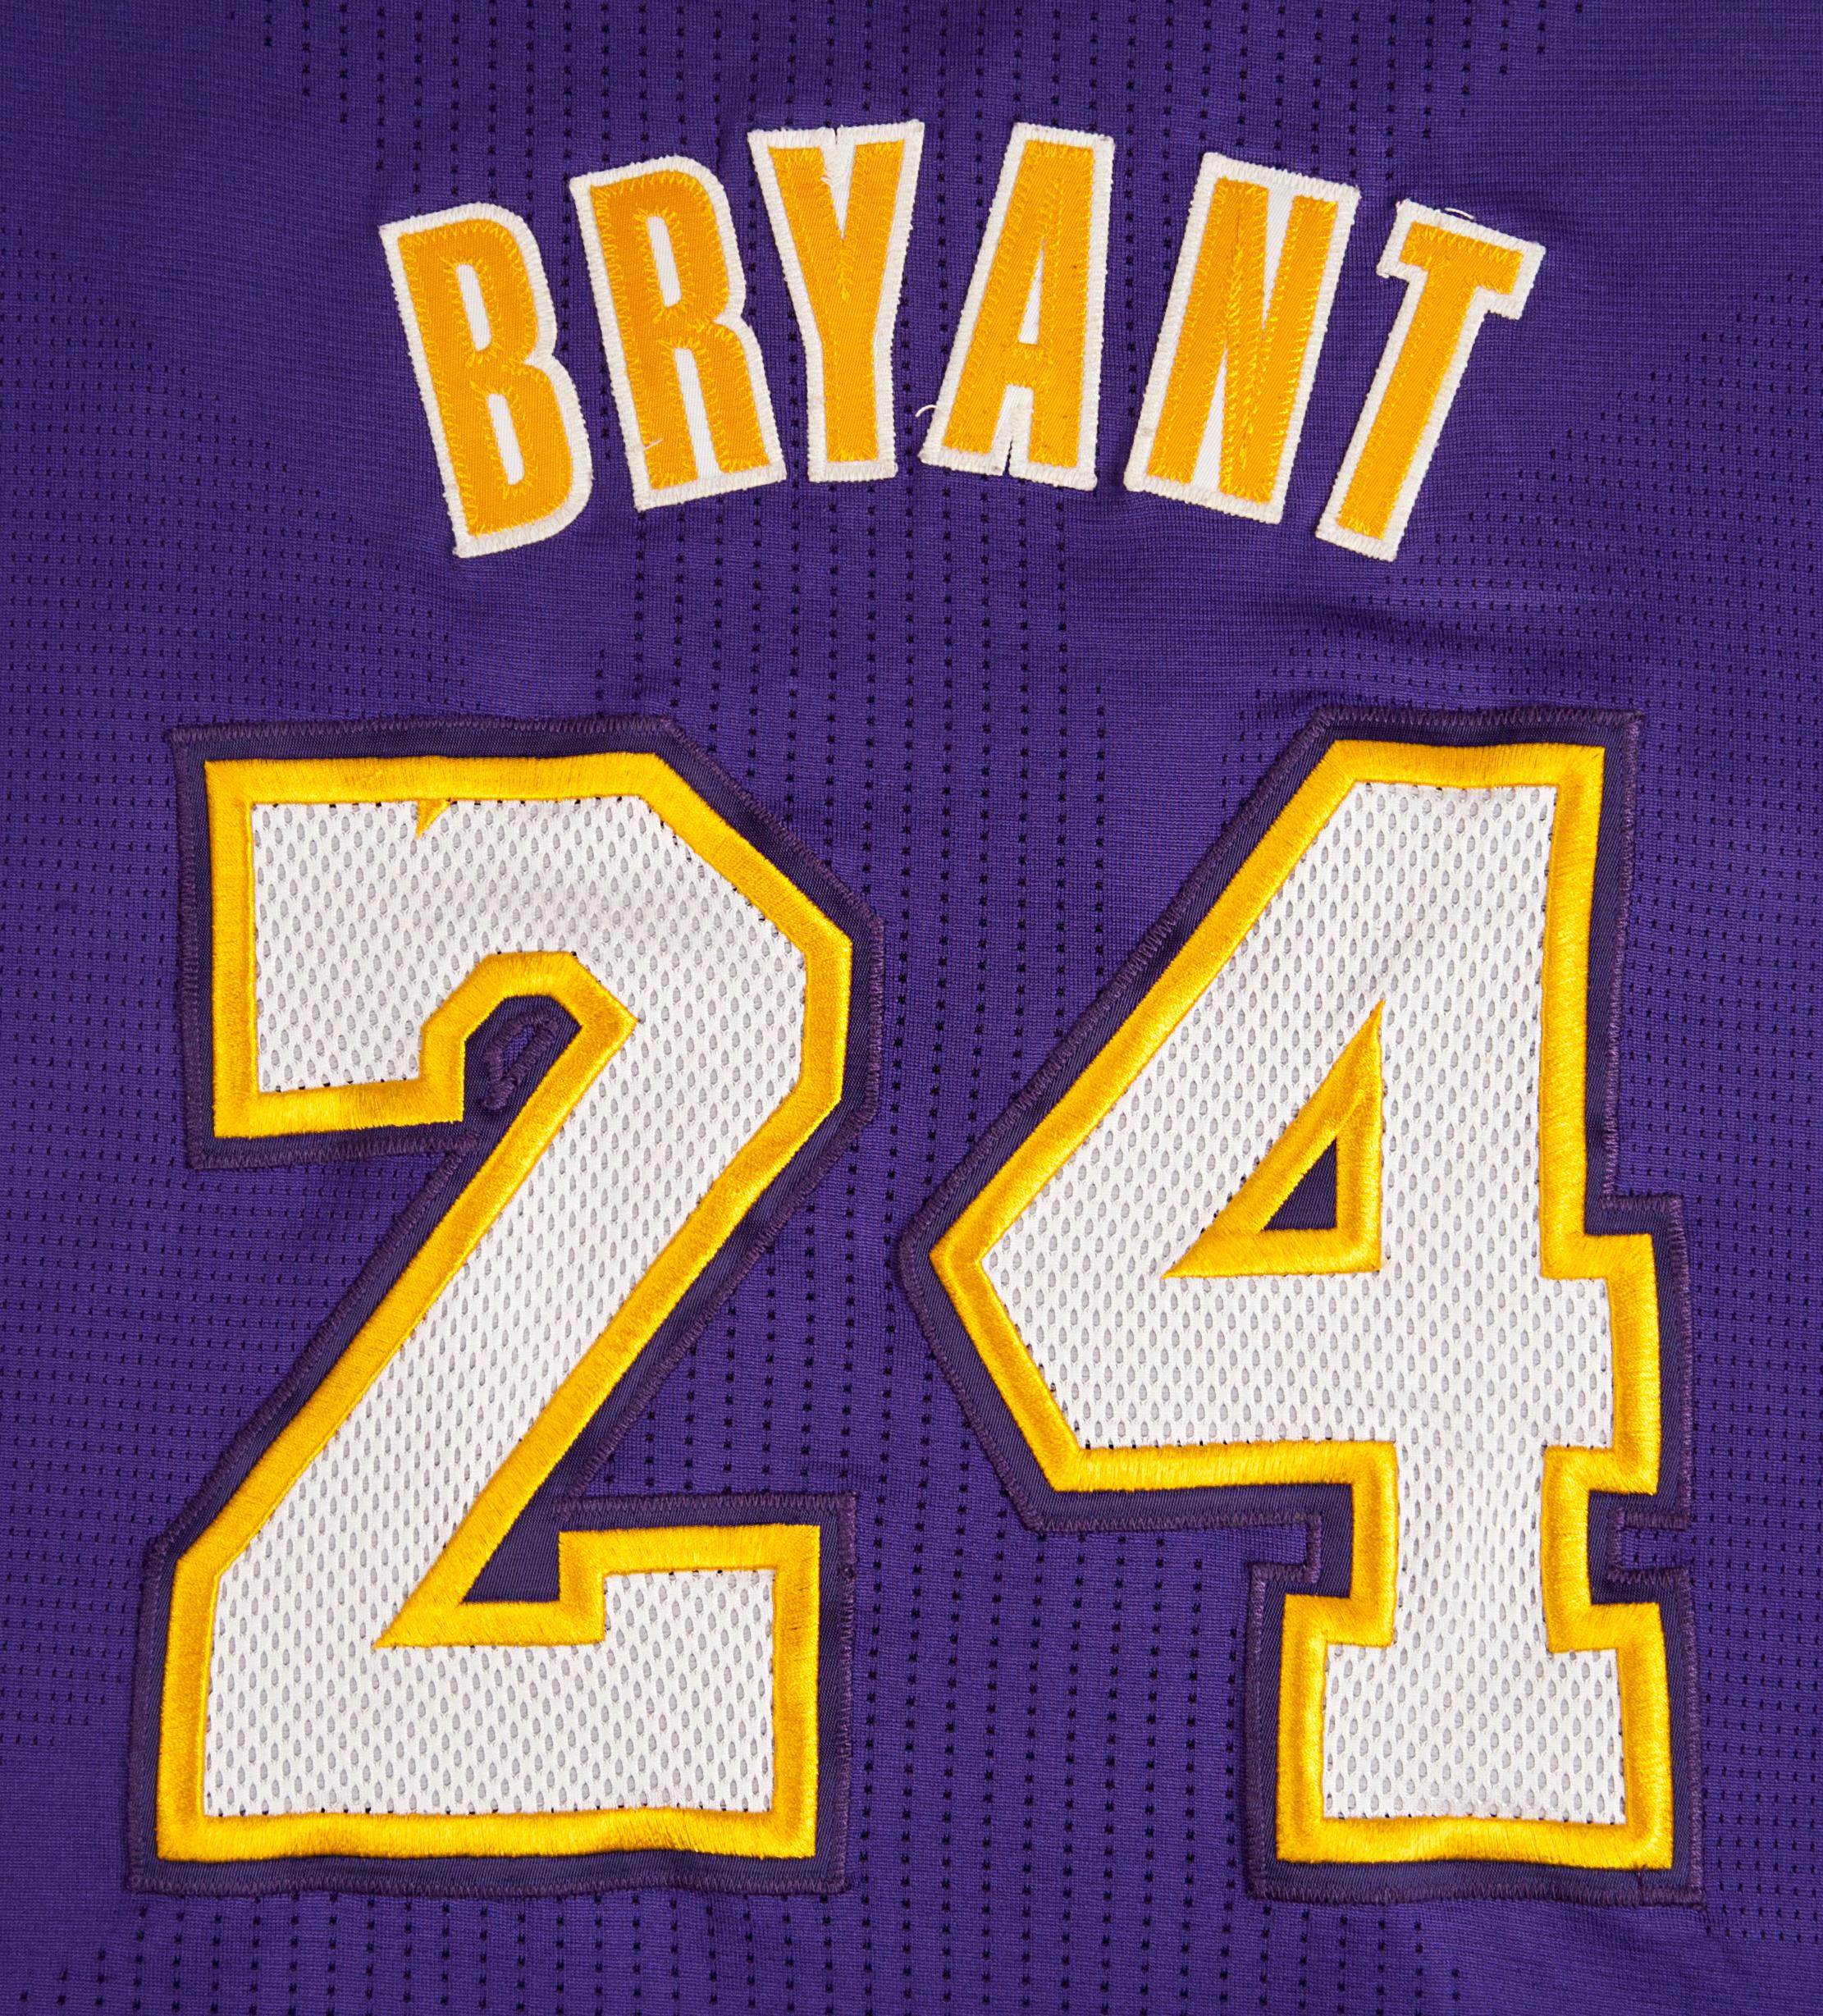 Adidas Logo Wallpaper Iphone Lot Detail 2010 2011 Kobe Bryant Game Used Lakers Jersey